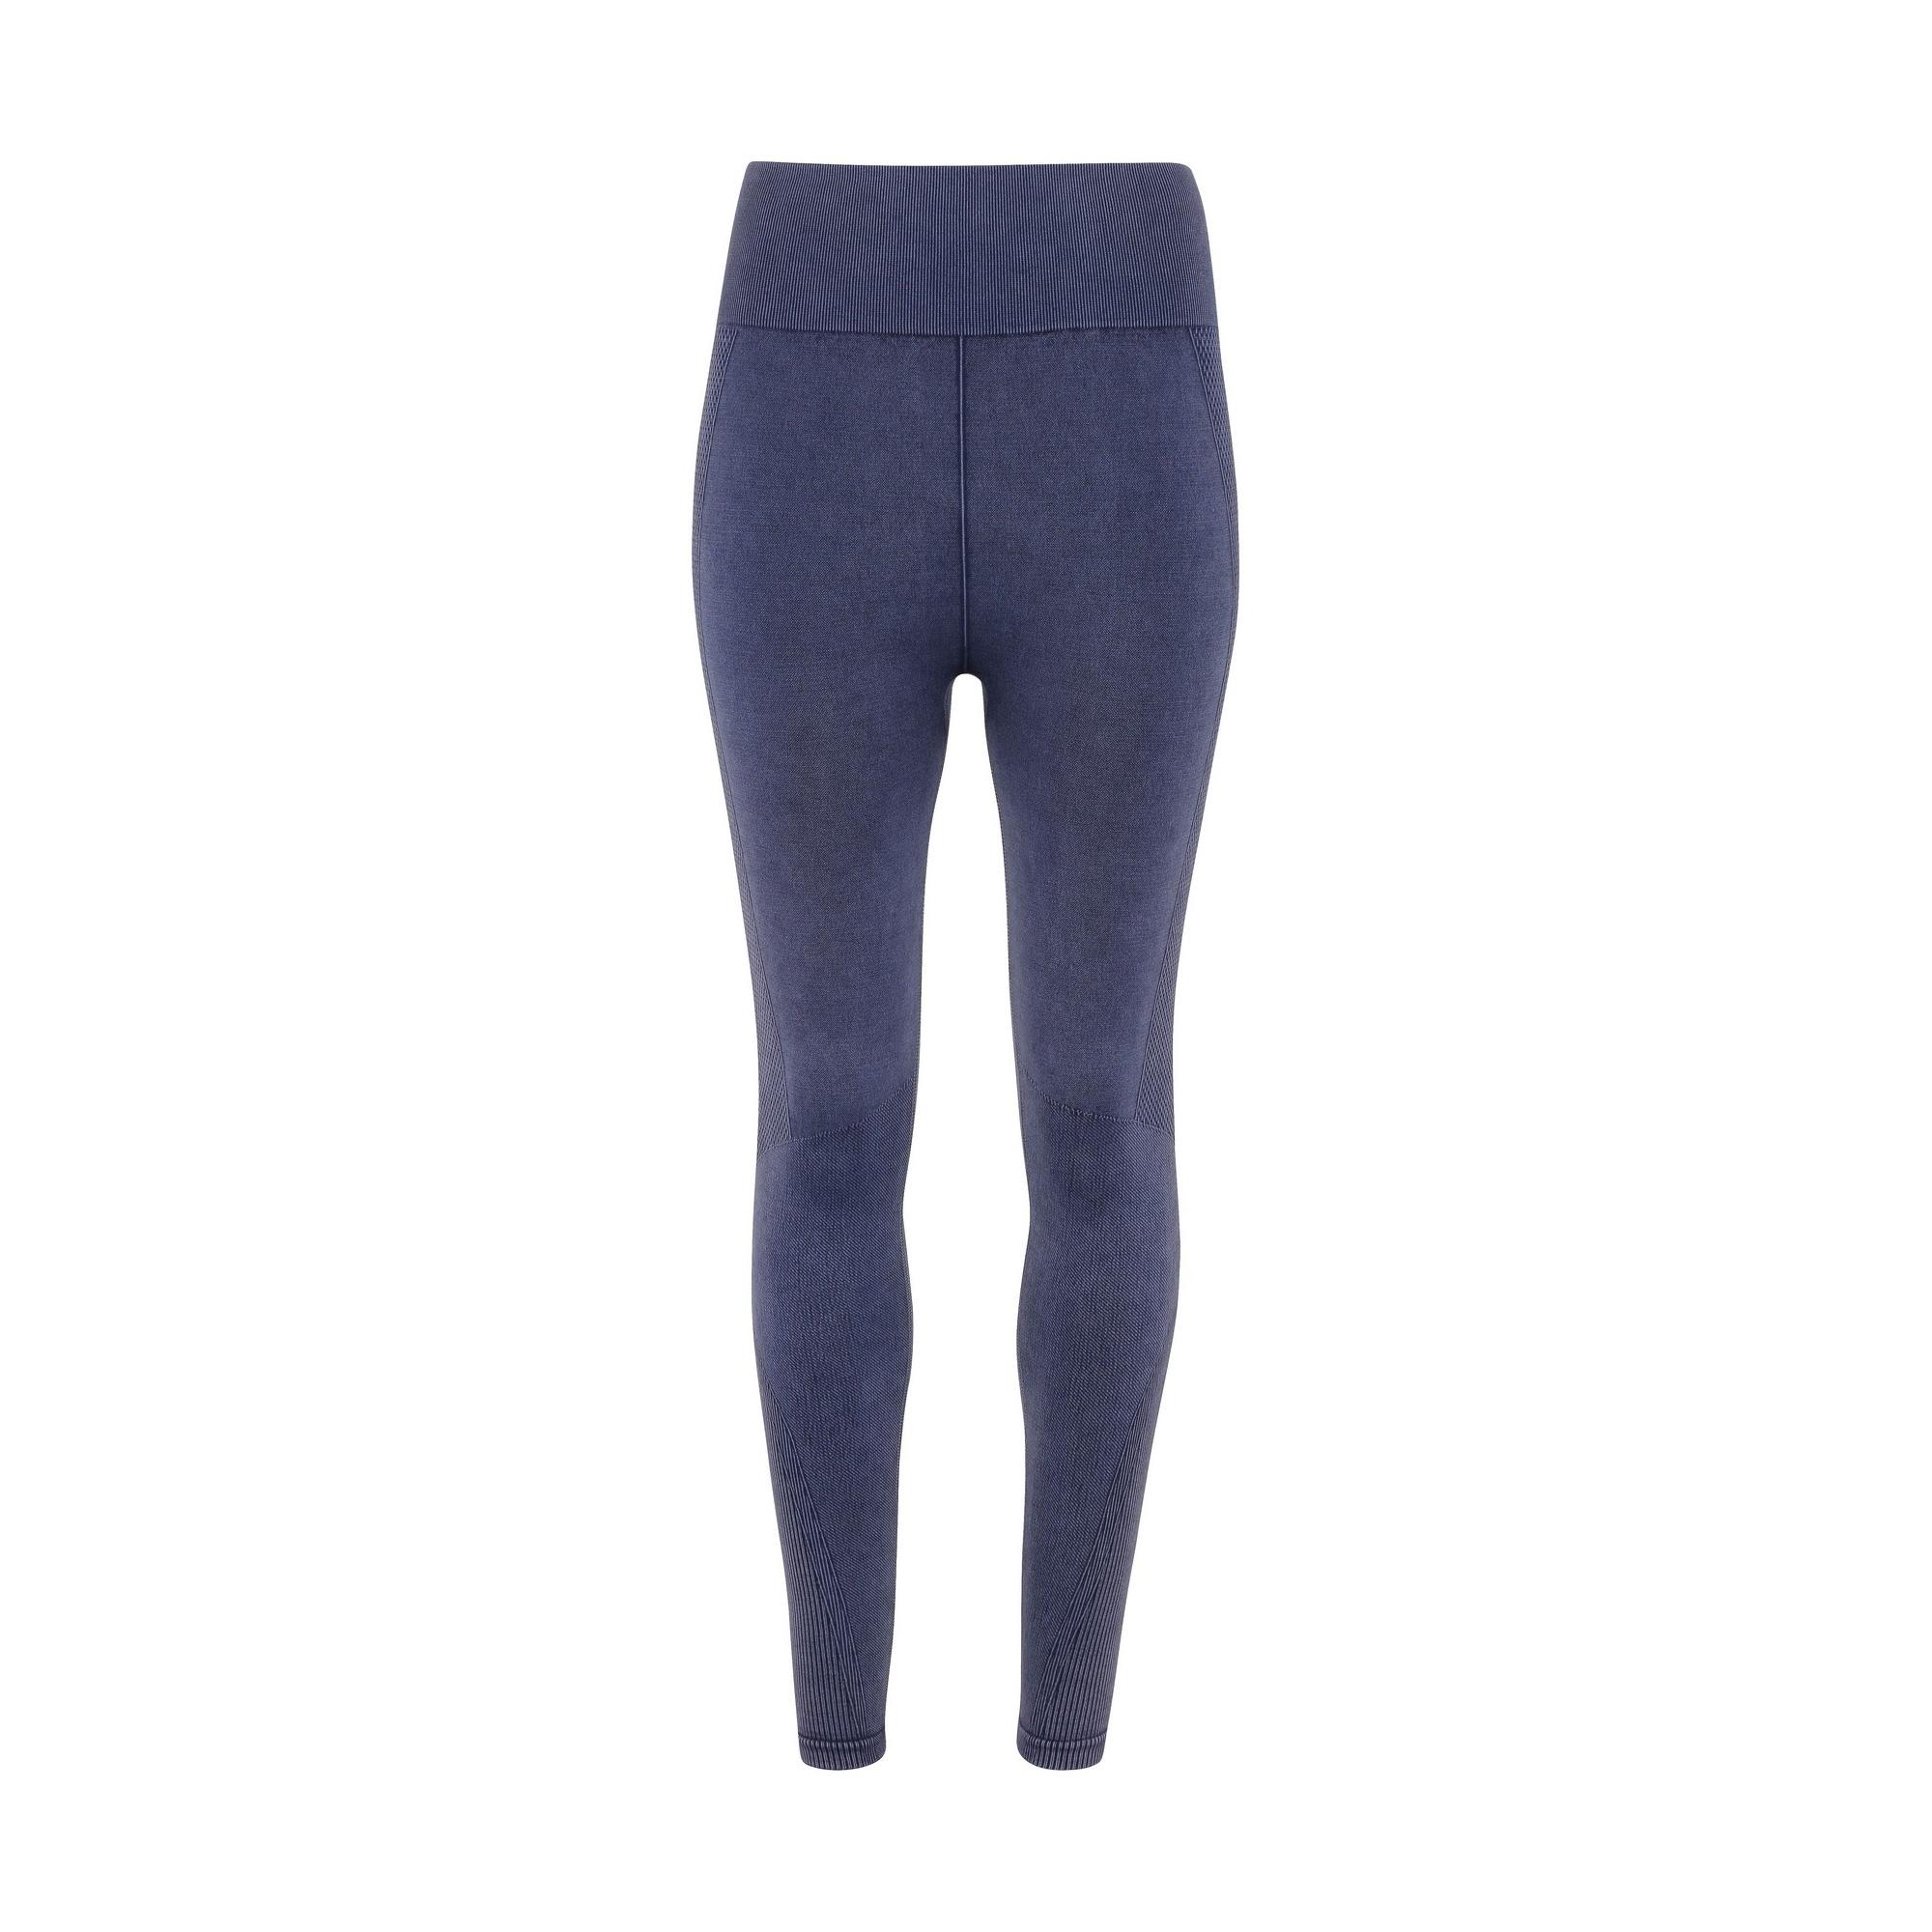 TriDri Womens/Ladies Seamless 3D Fit Multi Sport Denim Look Leggings (L) (Indigo Denim)